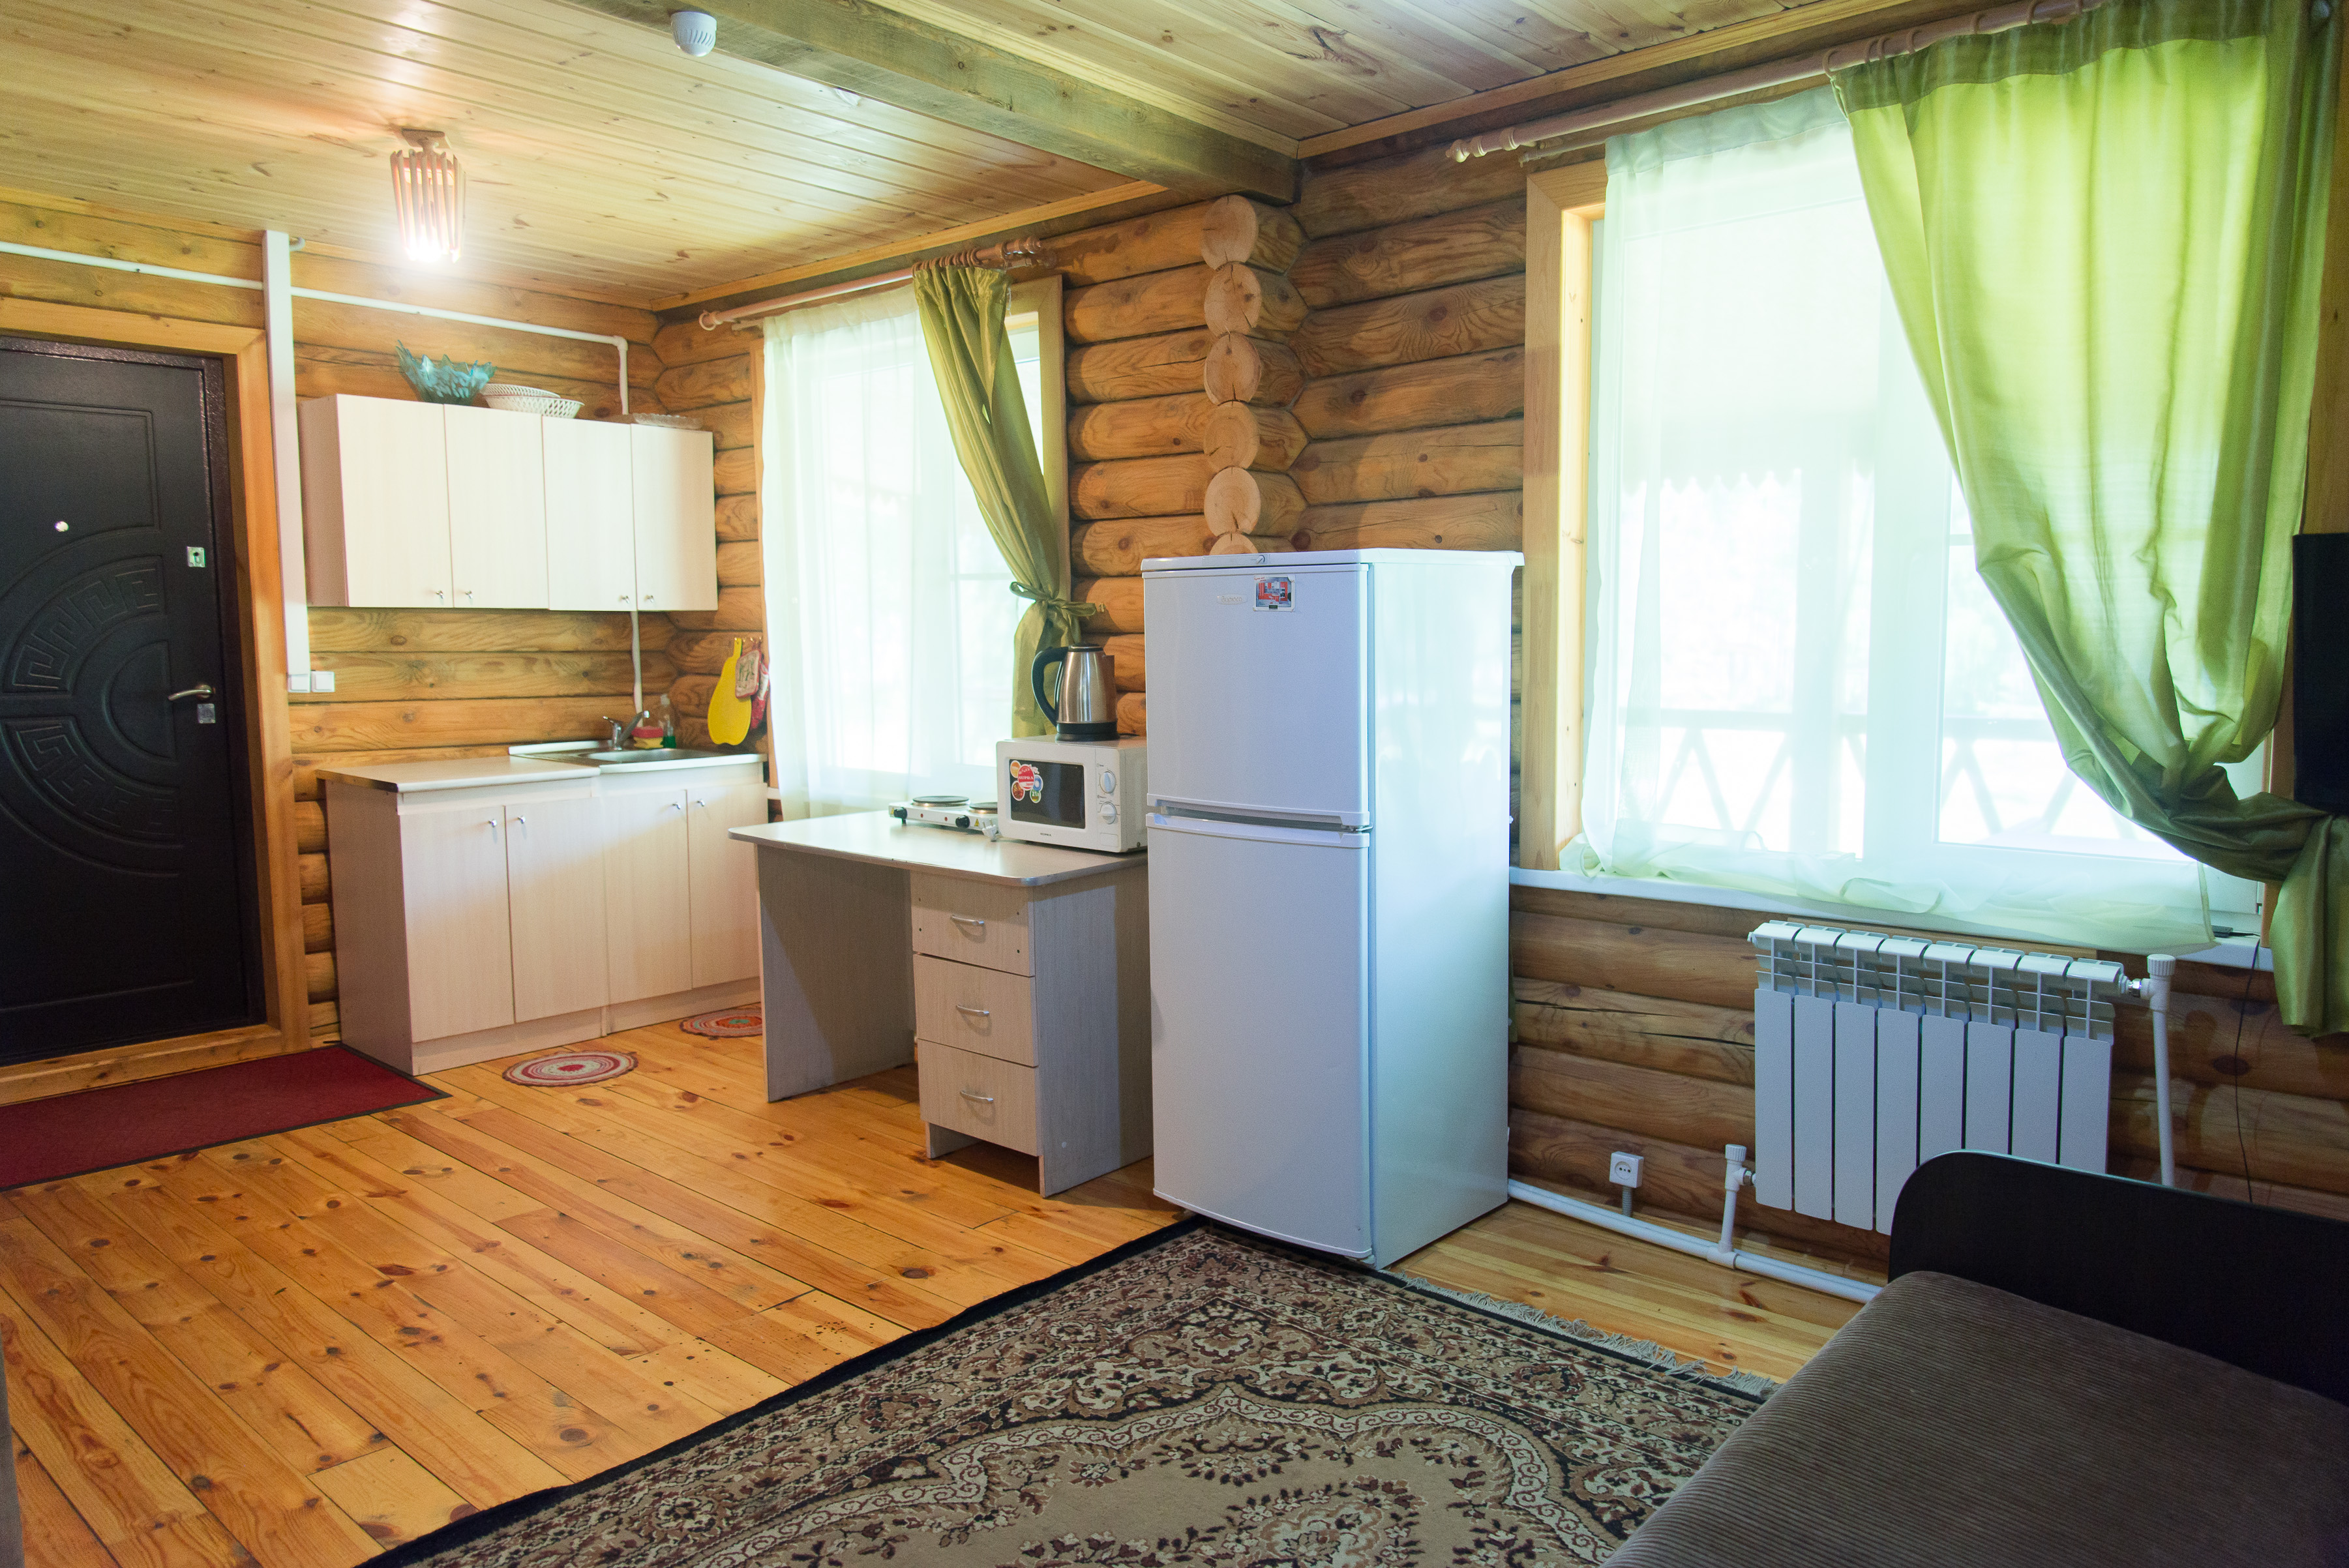 гостиная, кухня 1 этаж